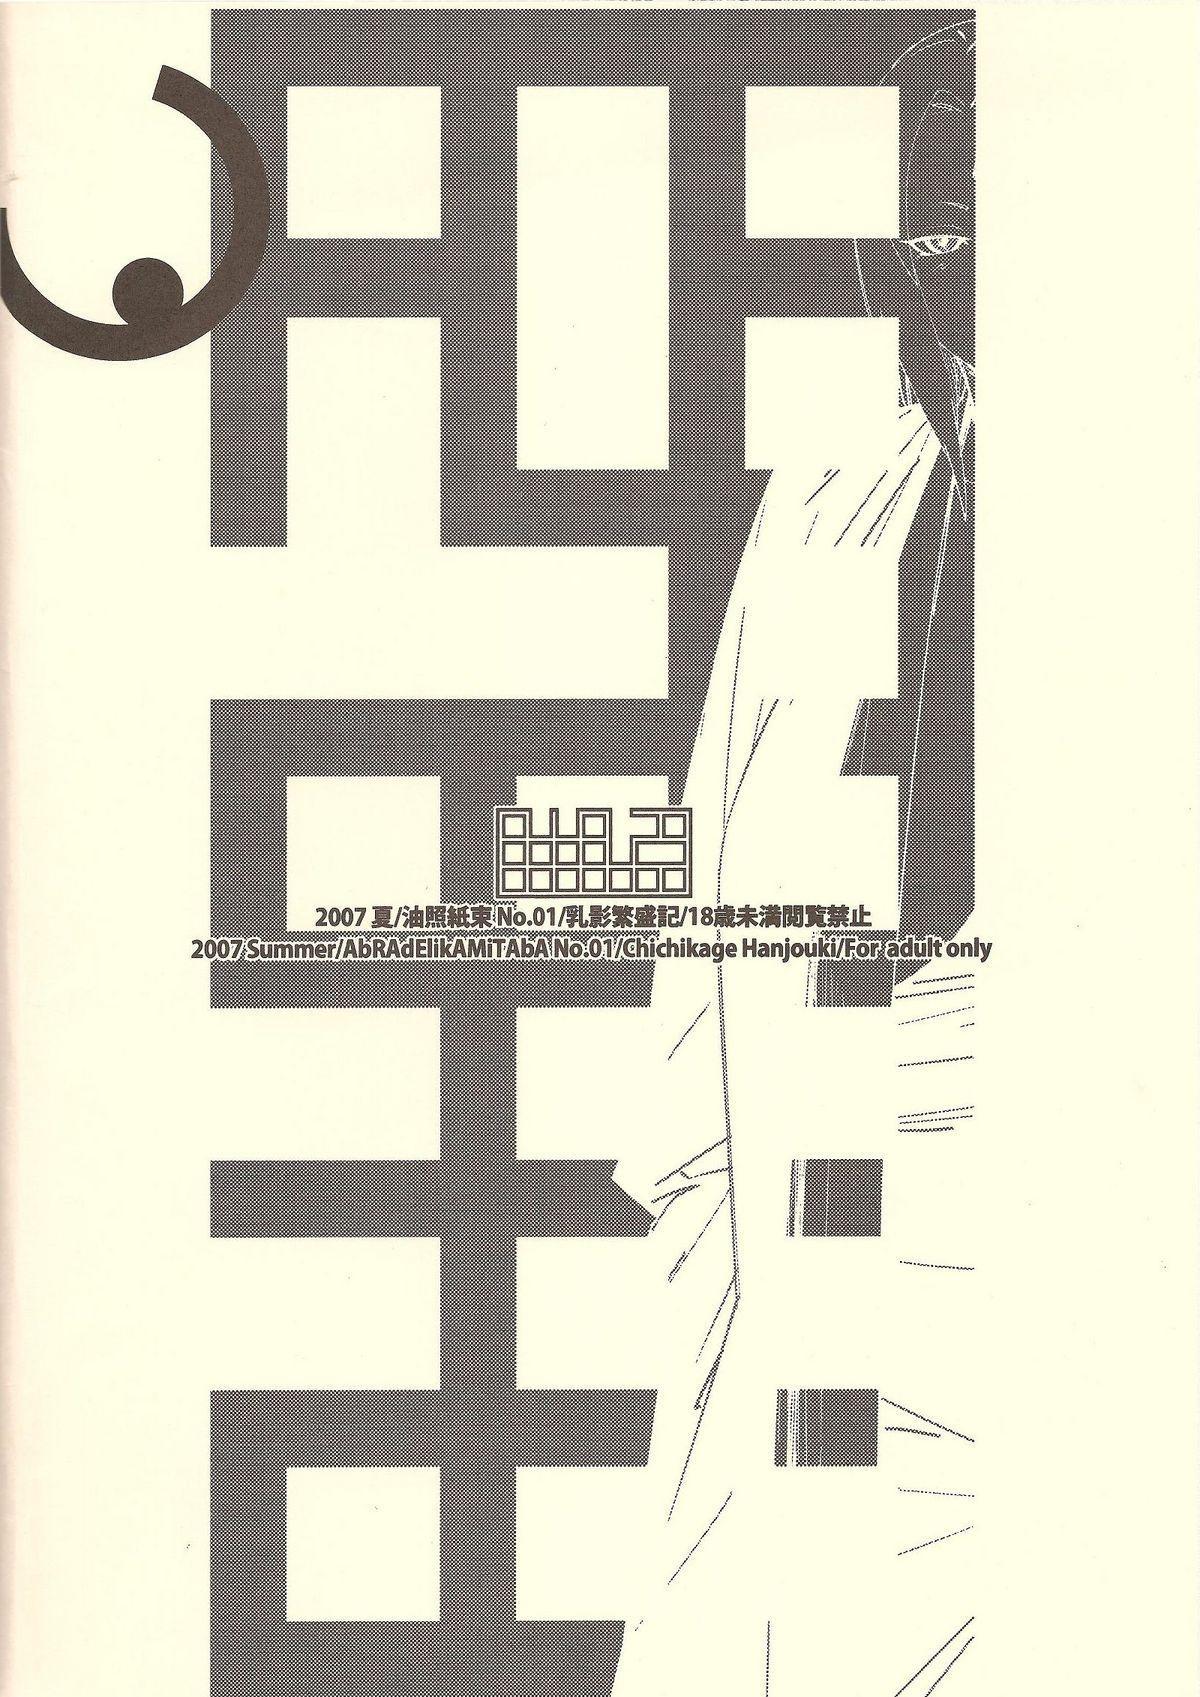 AbRAdEli kAMiTAbA No. 01 Chichikage Hanjouki 21